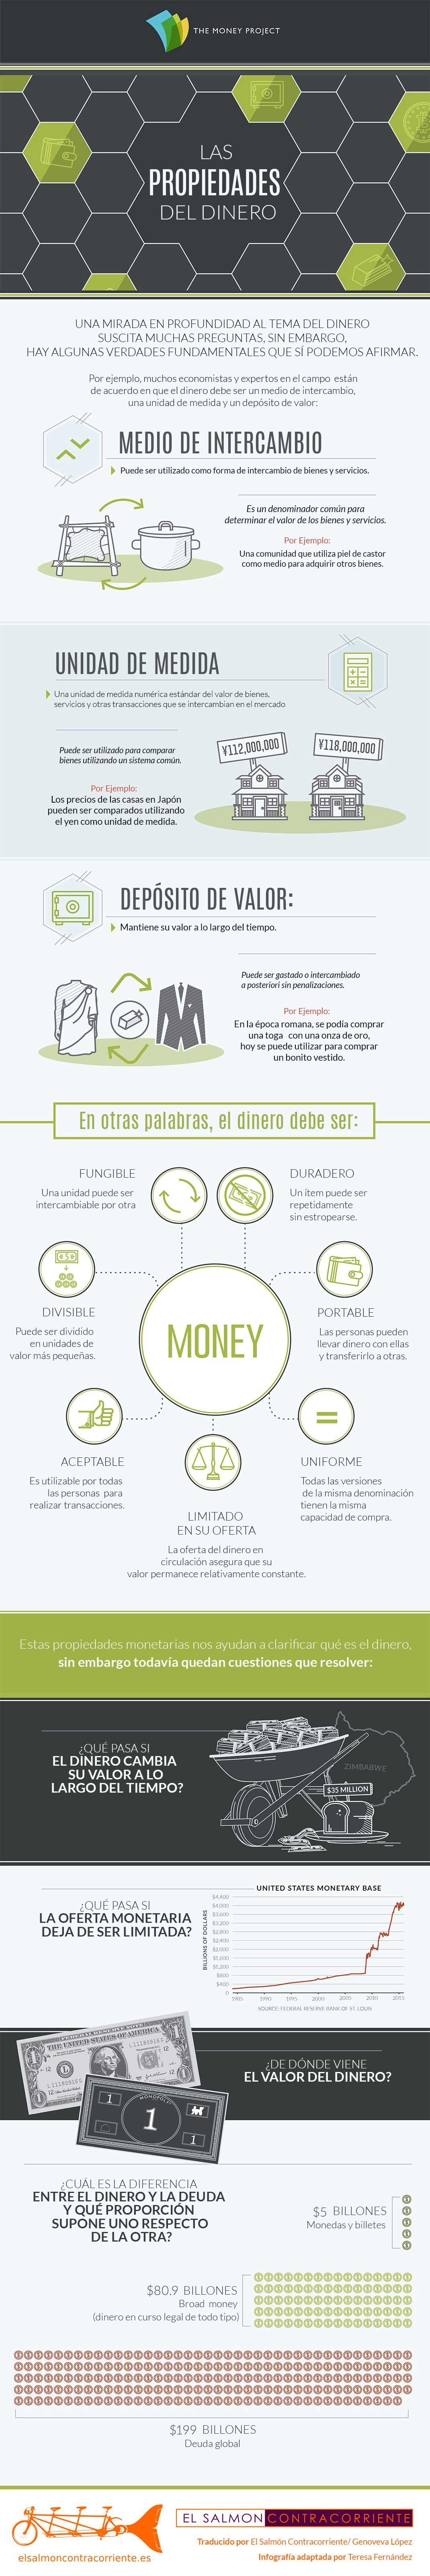 http://www.elsalmoncontracorriente.es/IMG/jpg/properties-of-money-infographic_esp_pie.jpg